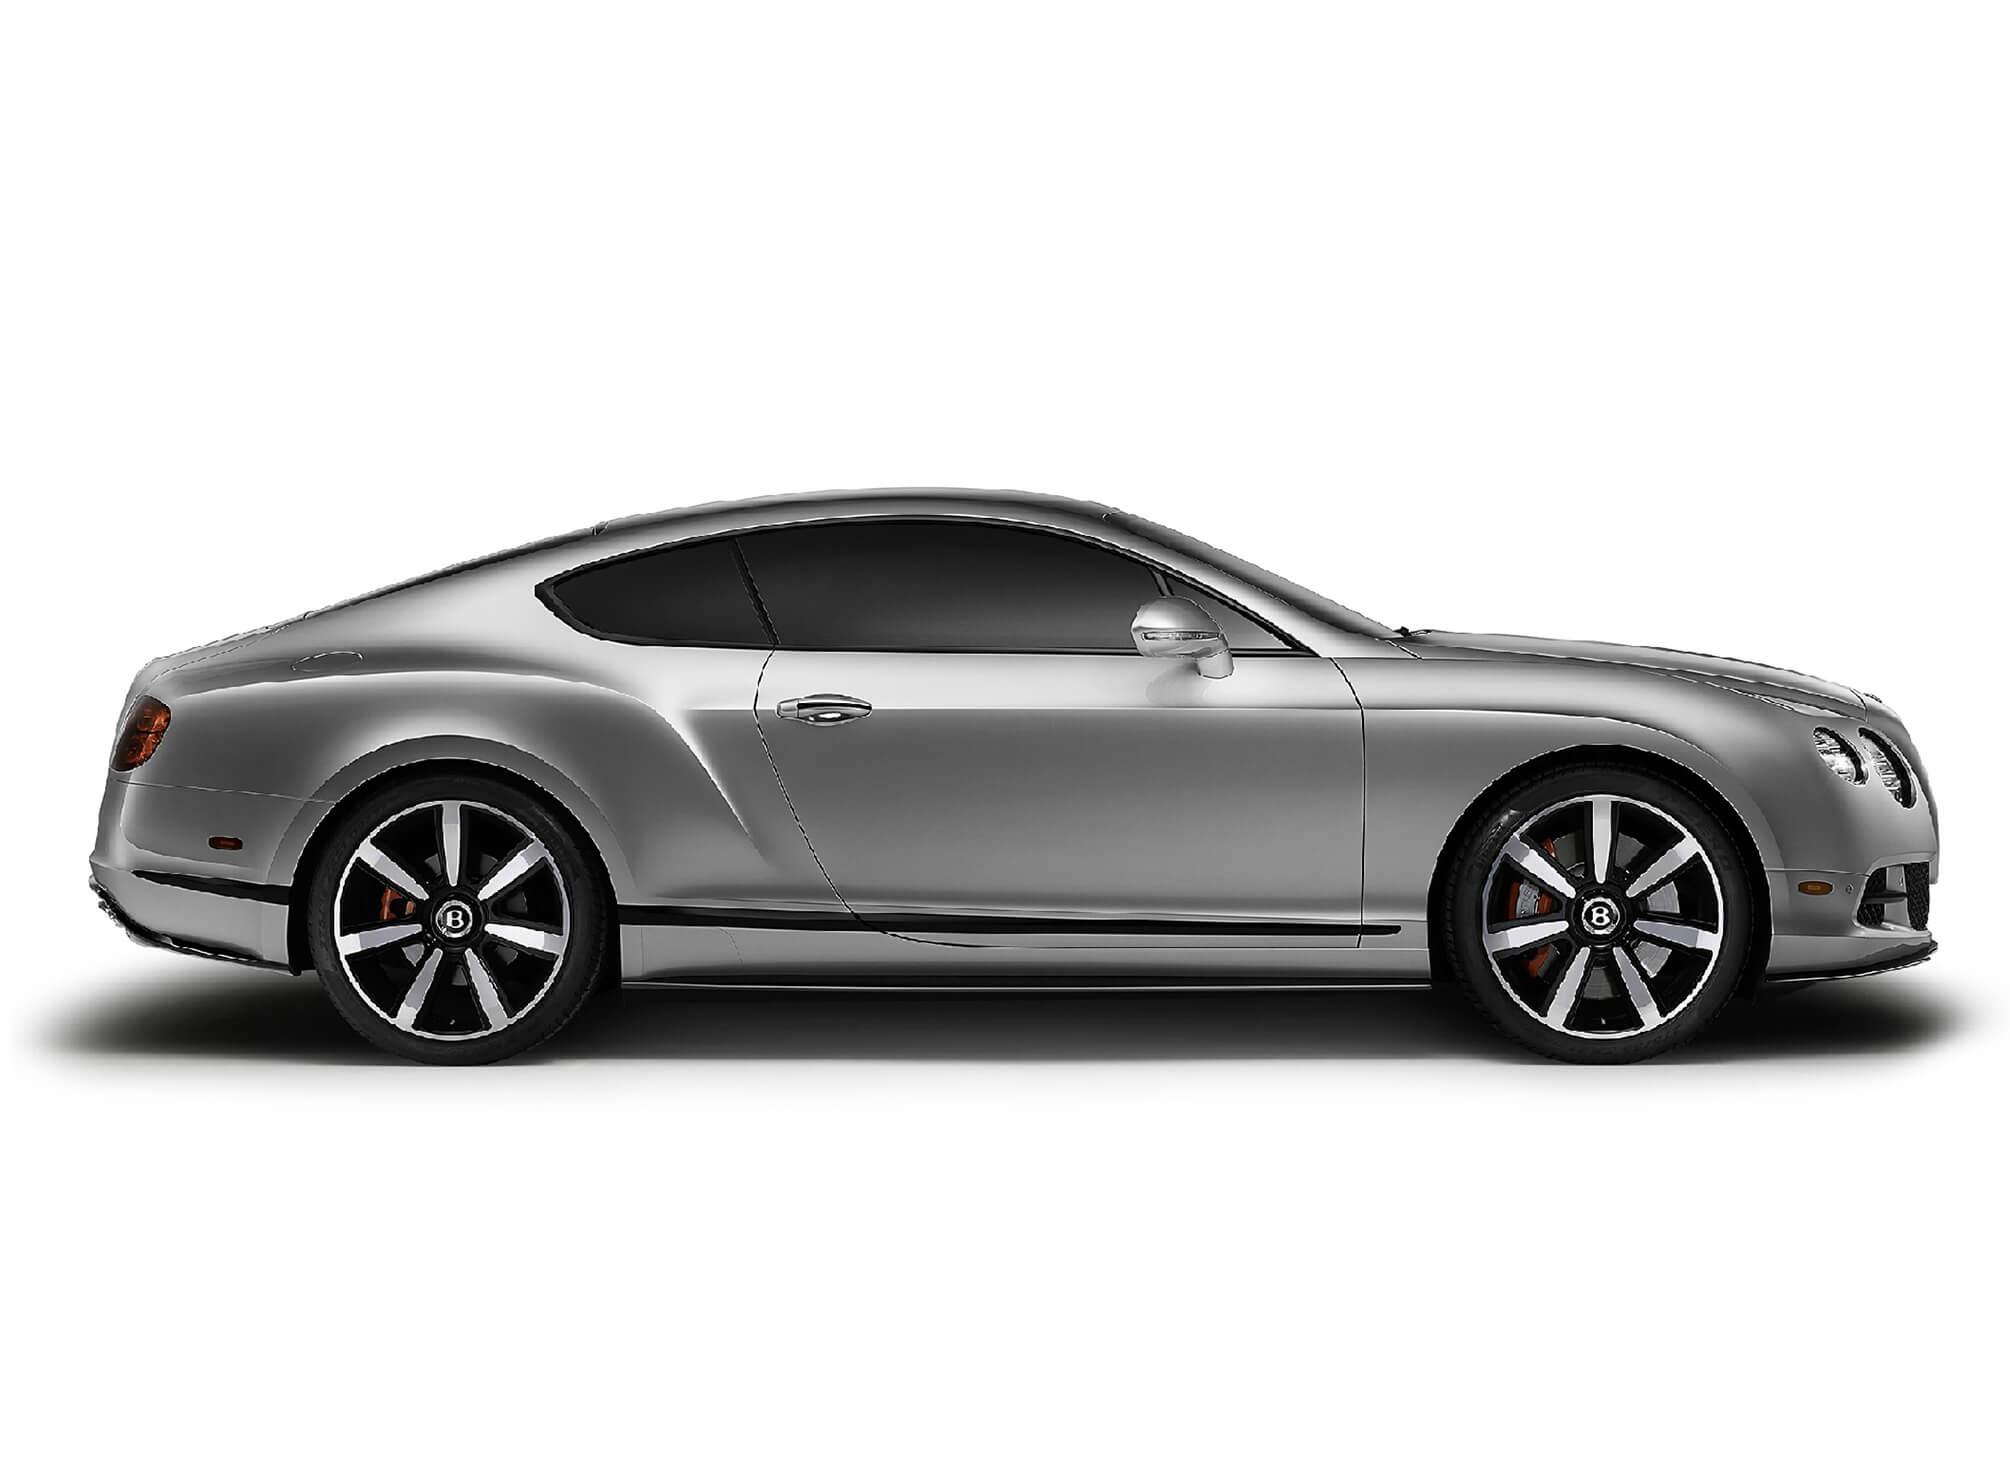 Blackline Window Surround for Continental GT V8   Bentley ...